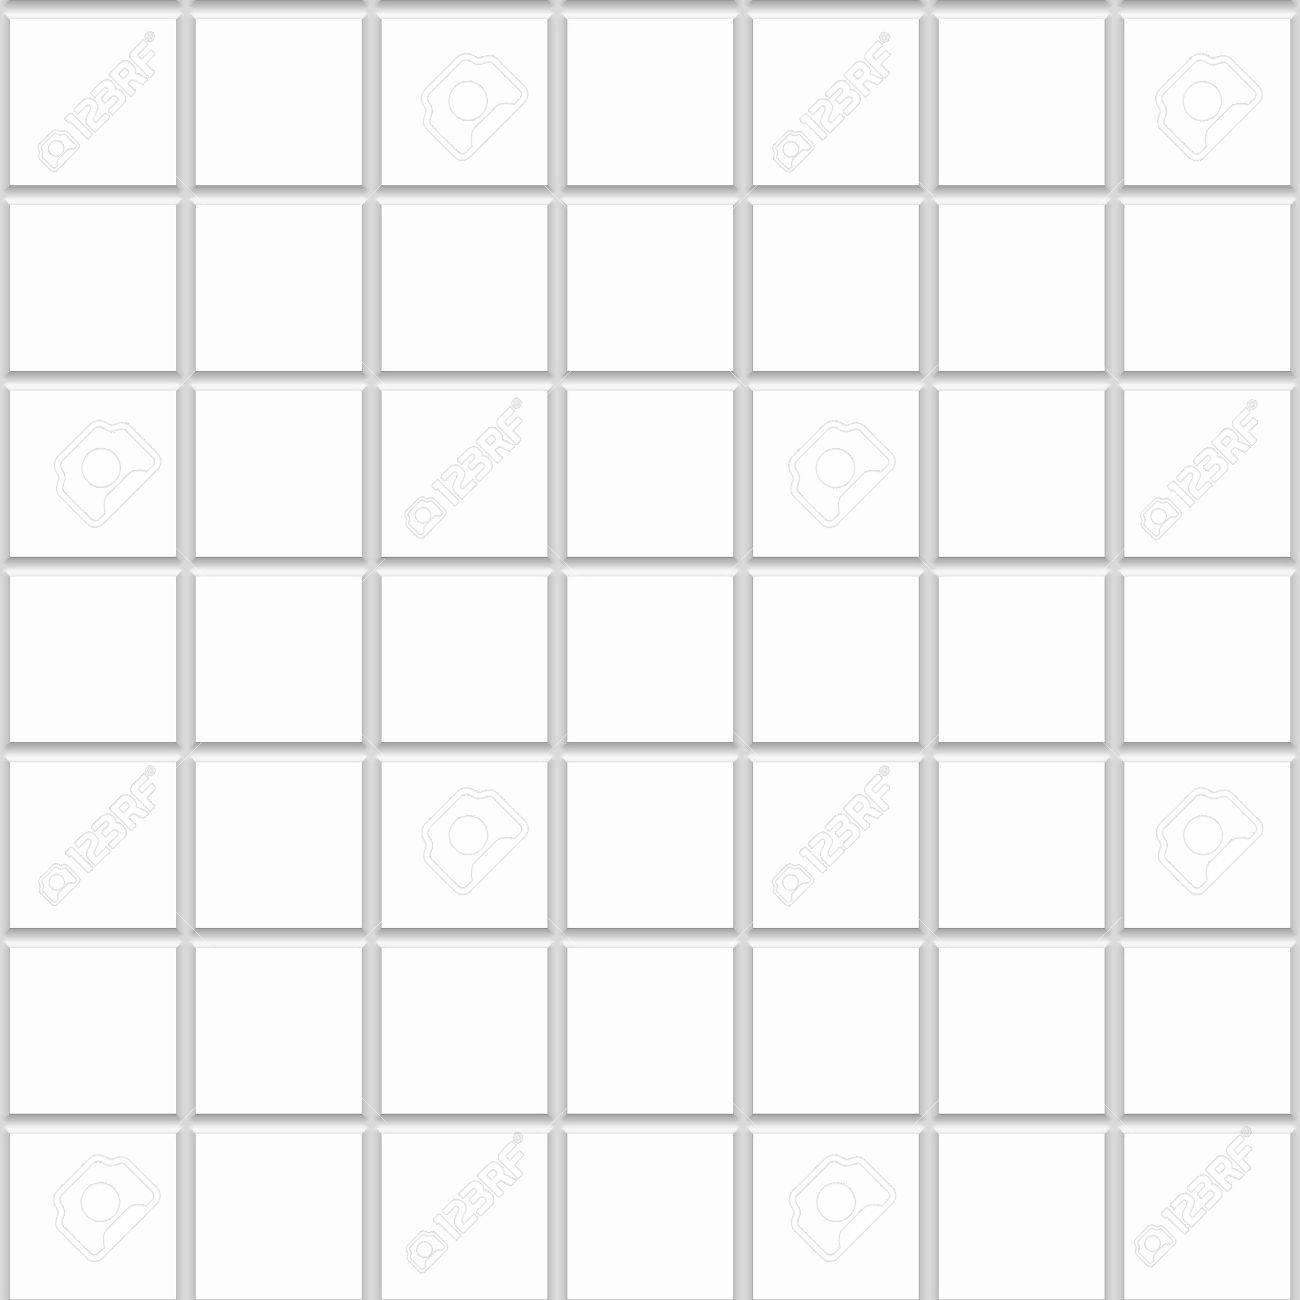 White floor tile texture choice image tile flooring design ideas white subway tile texture choice image tile flooring design ideas white floor tile texture images tile doublecrazyfo Image collections